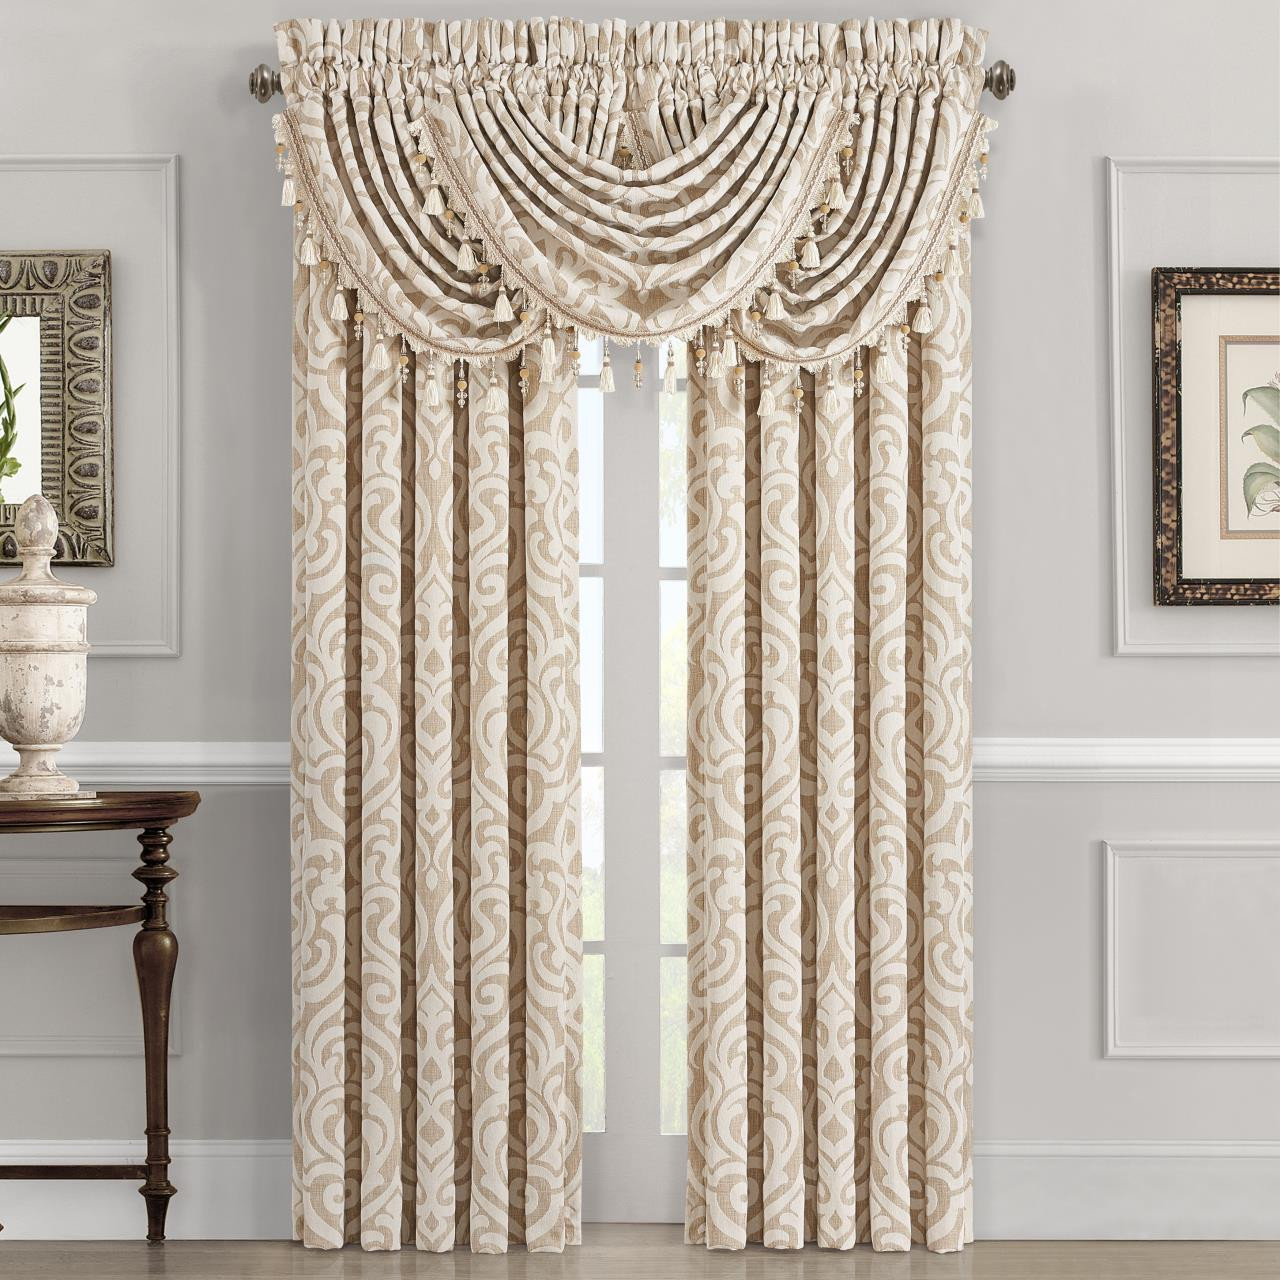 Milano Sand Curtains - 846339088285